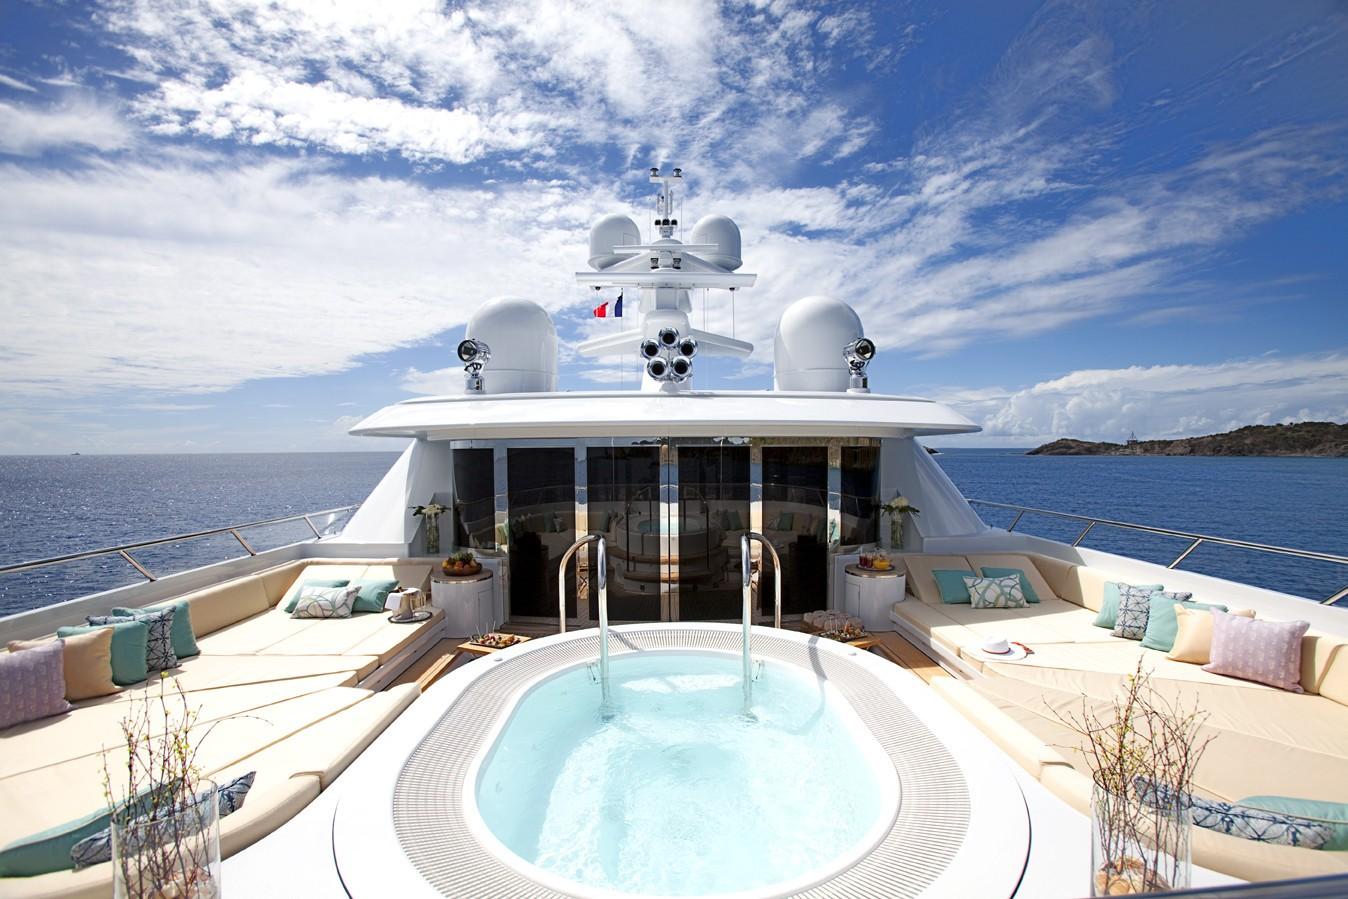 Jacuzzi Pool Aboard Yacht LADY BRITT